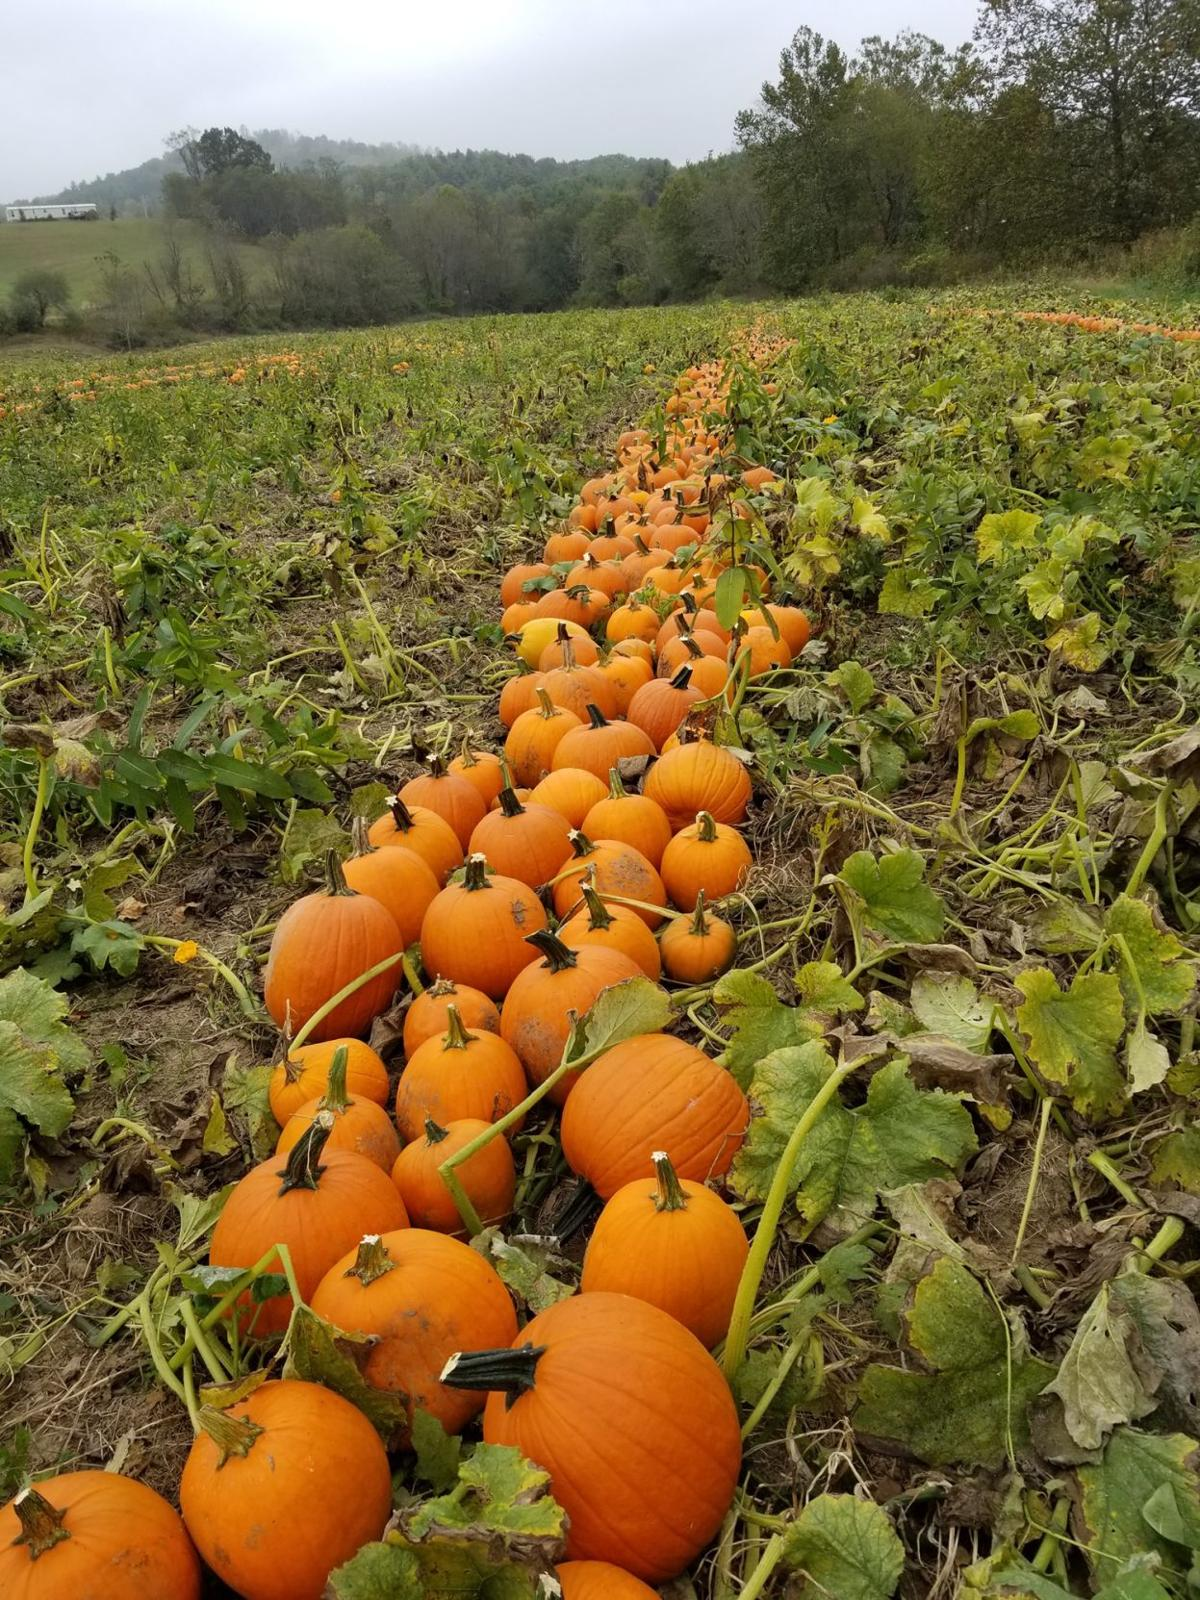 Pumpkin Growers Ready For Season Despite Months Of Drought Latest Headlines Swvatoday Com